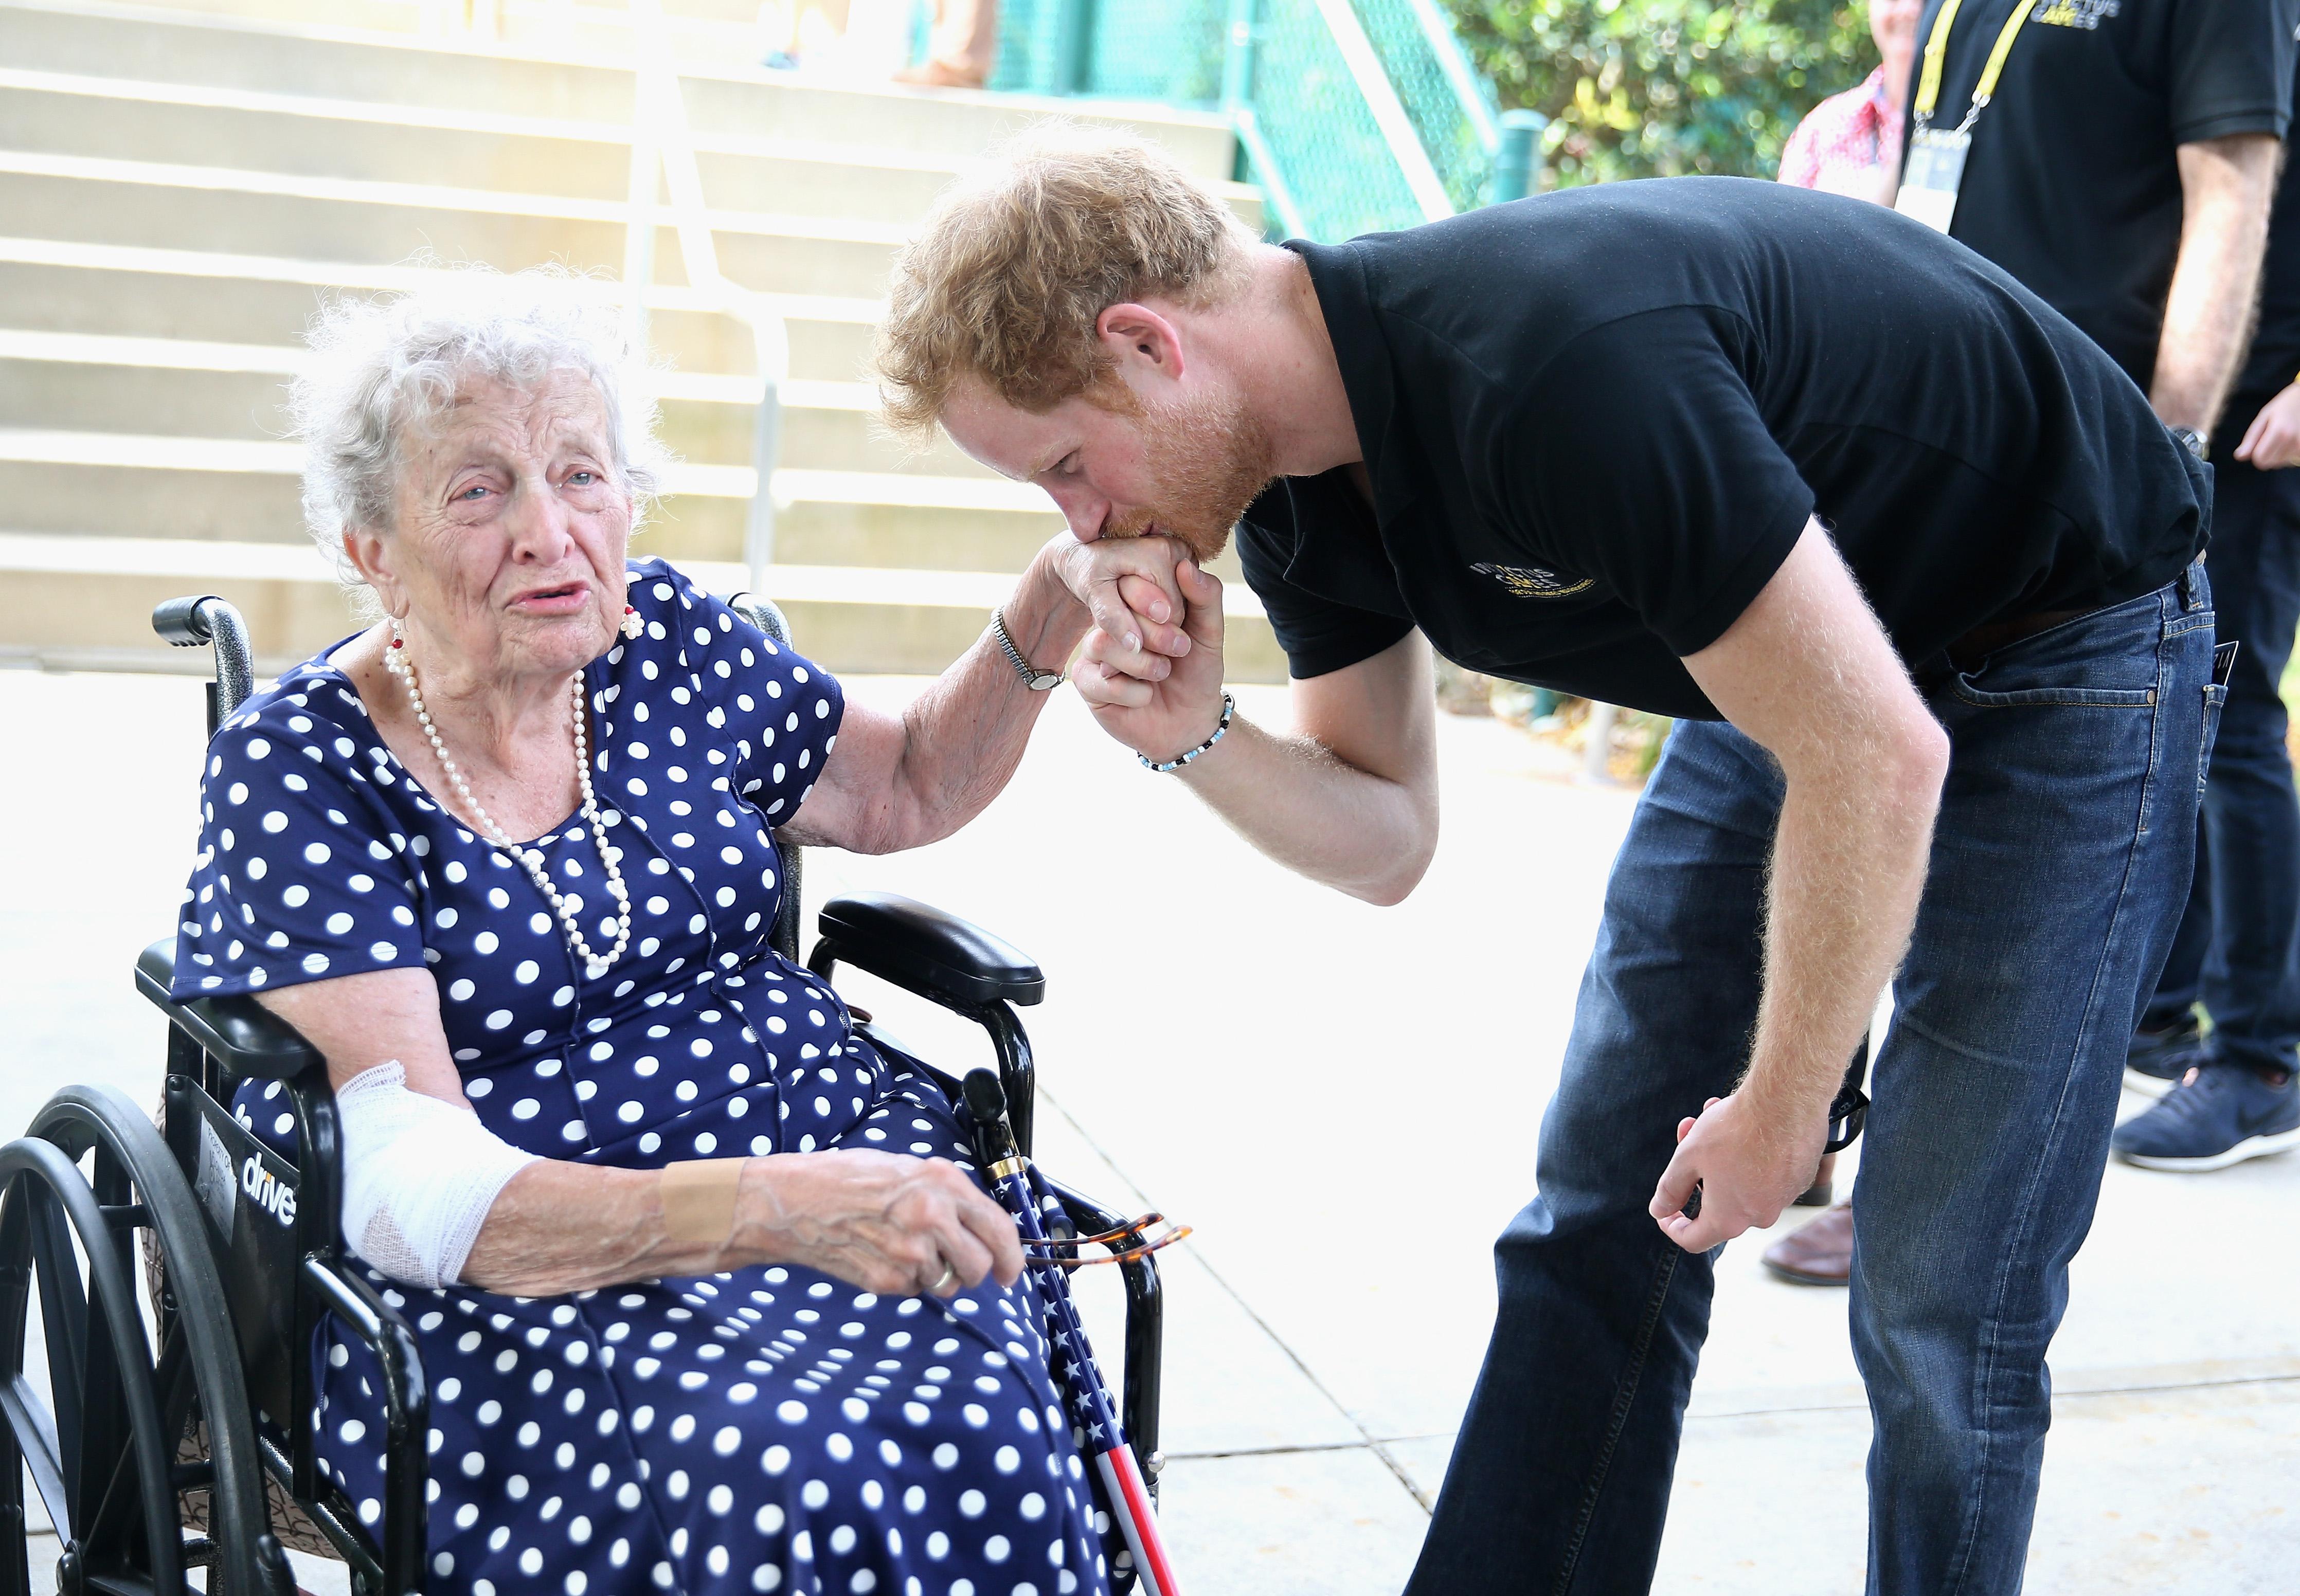 Prince Harry spectator at wheelchair tennis